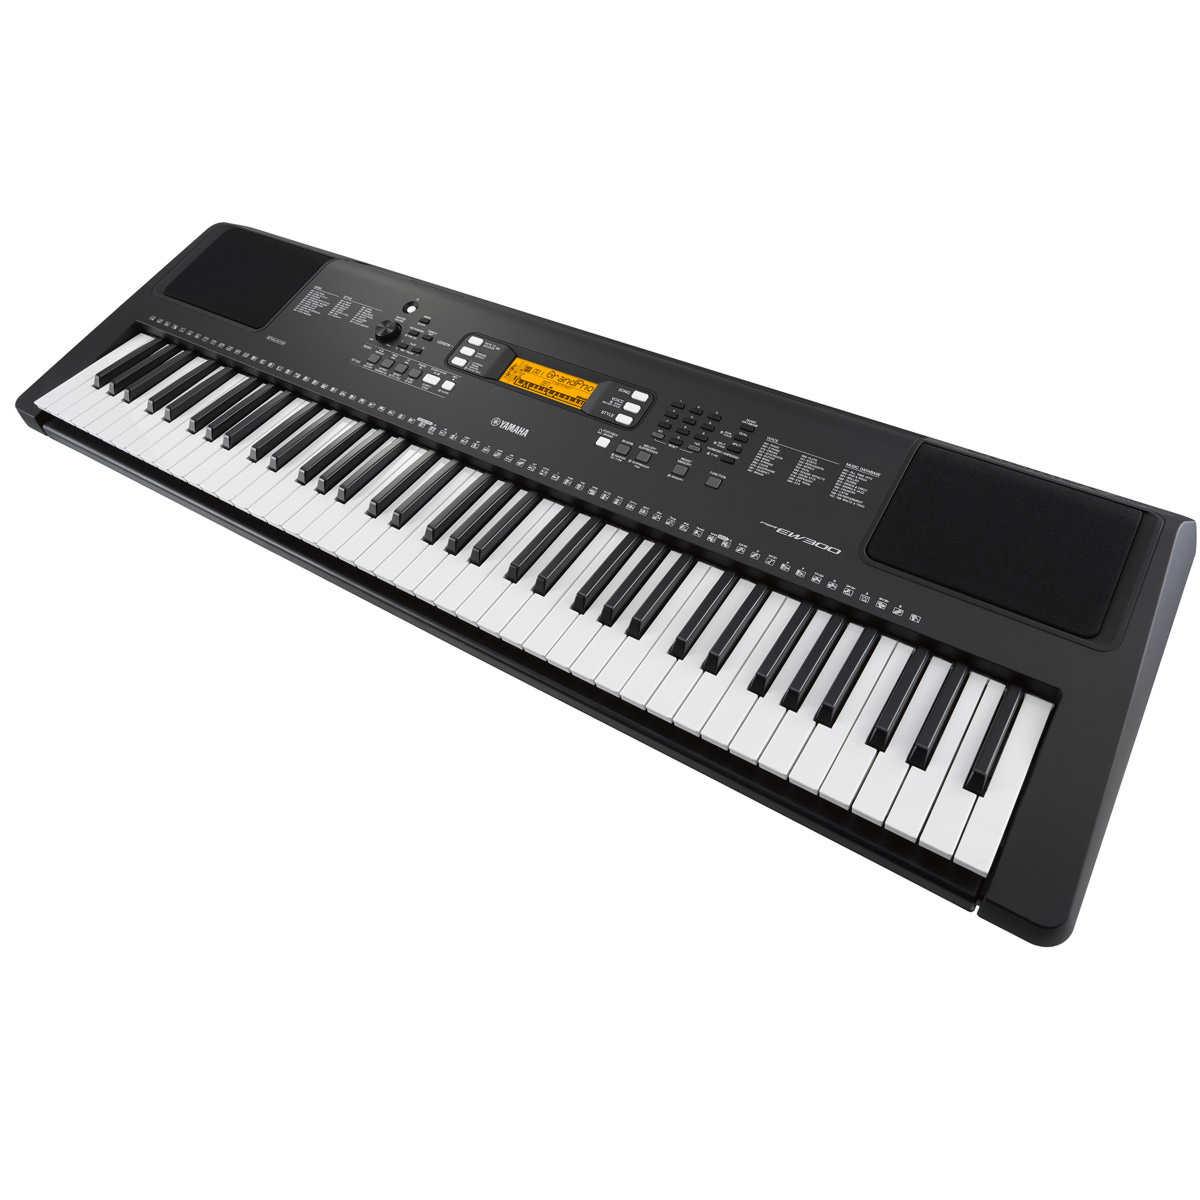 Yamaha PSREW300 Keyboard